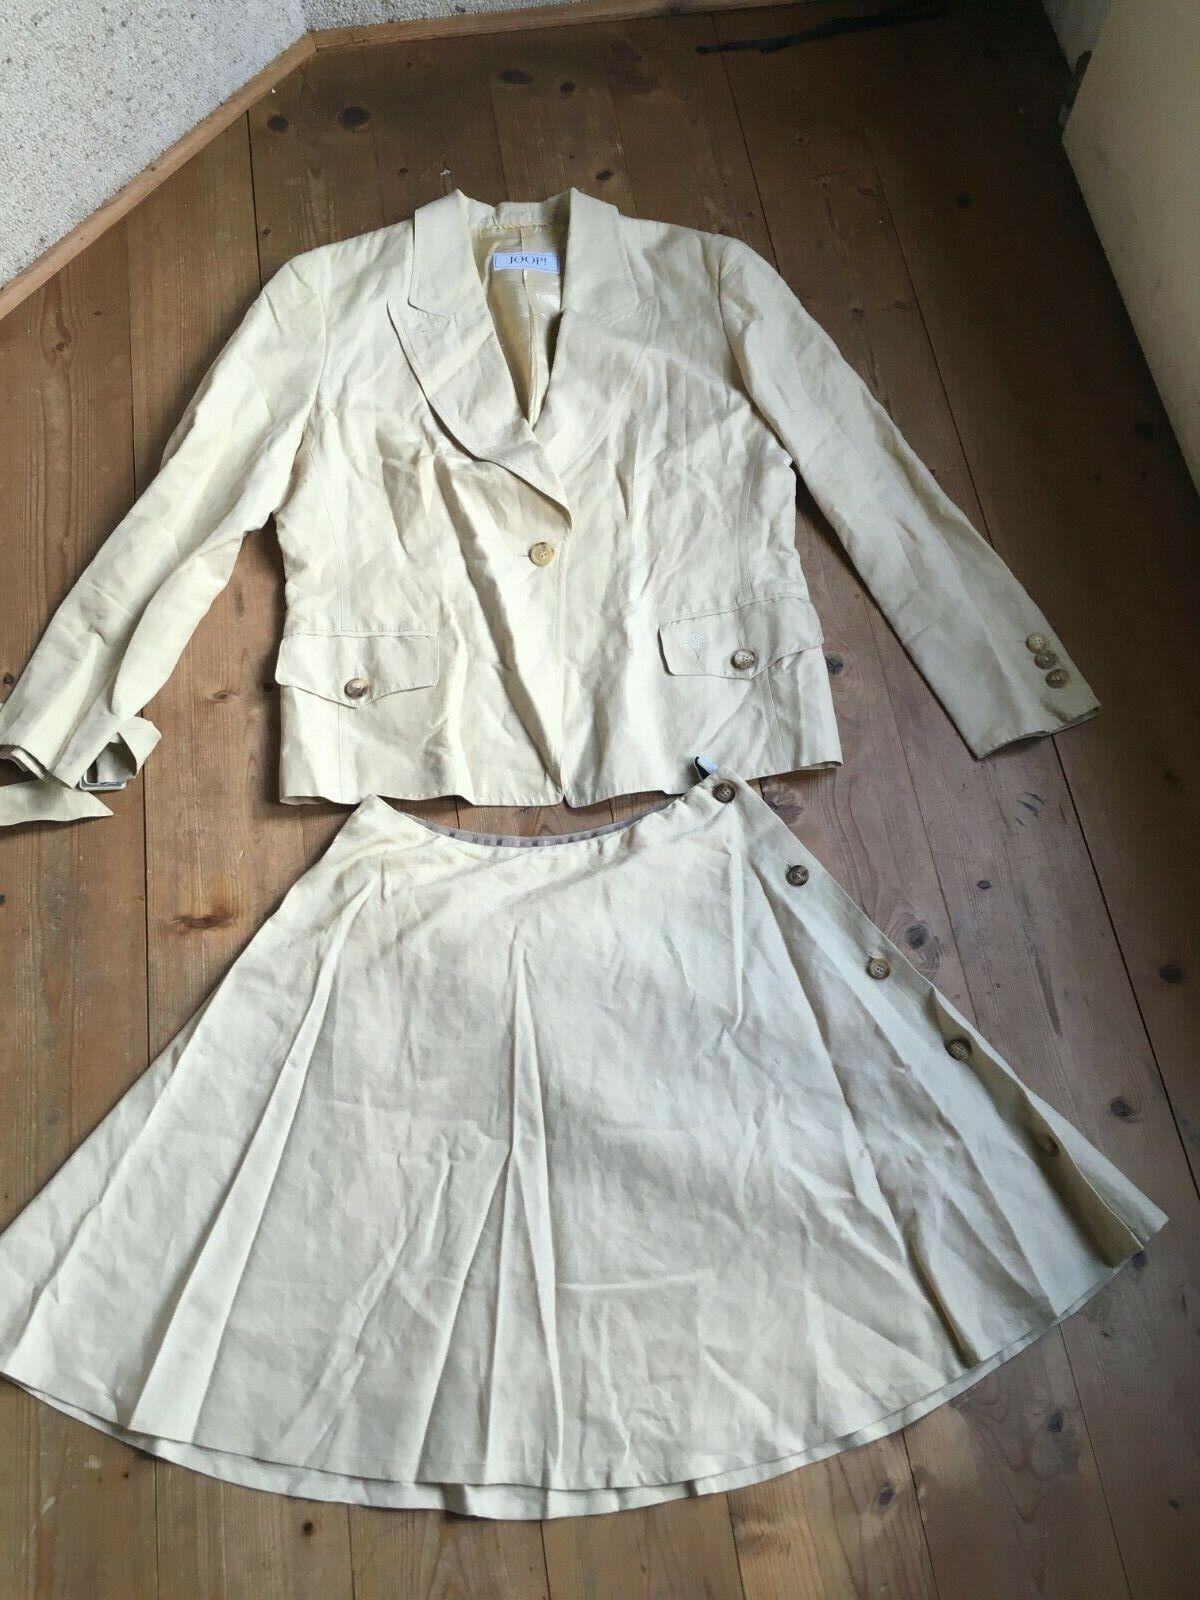 Traje JOOP plato falda  envoltura óptica chaqueta Safari champager lino seda 38 40  barato